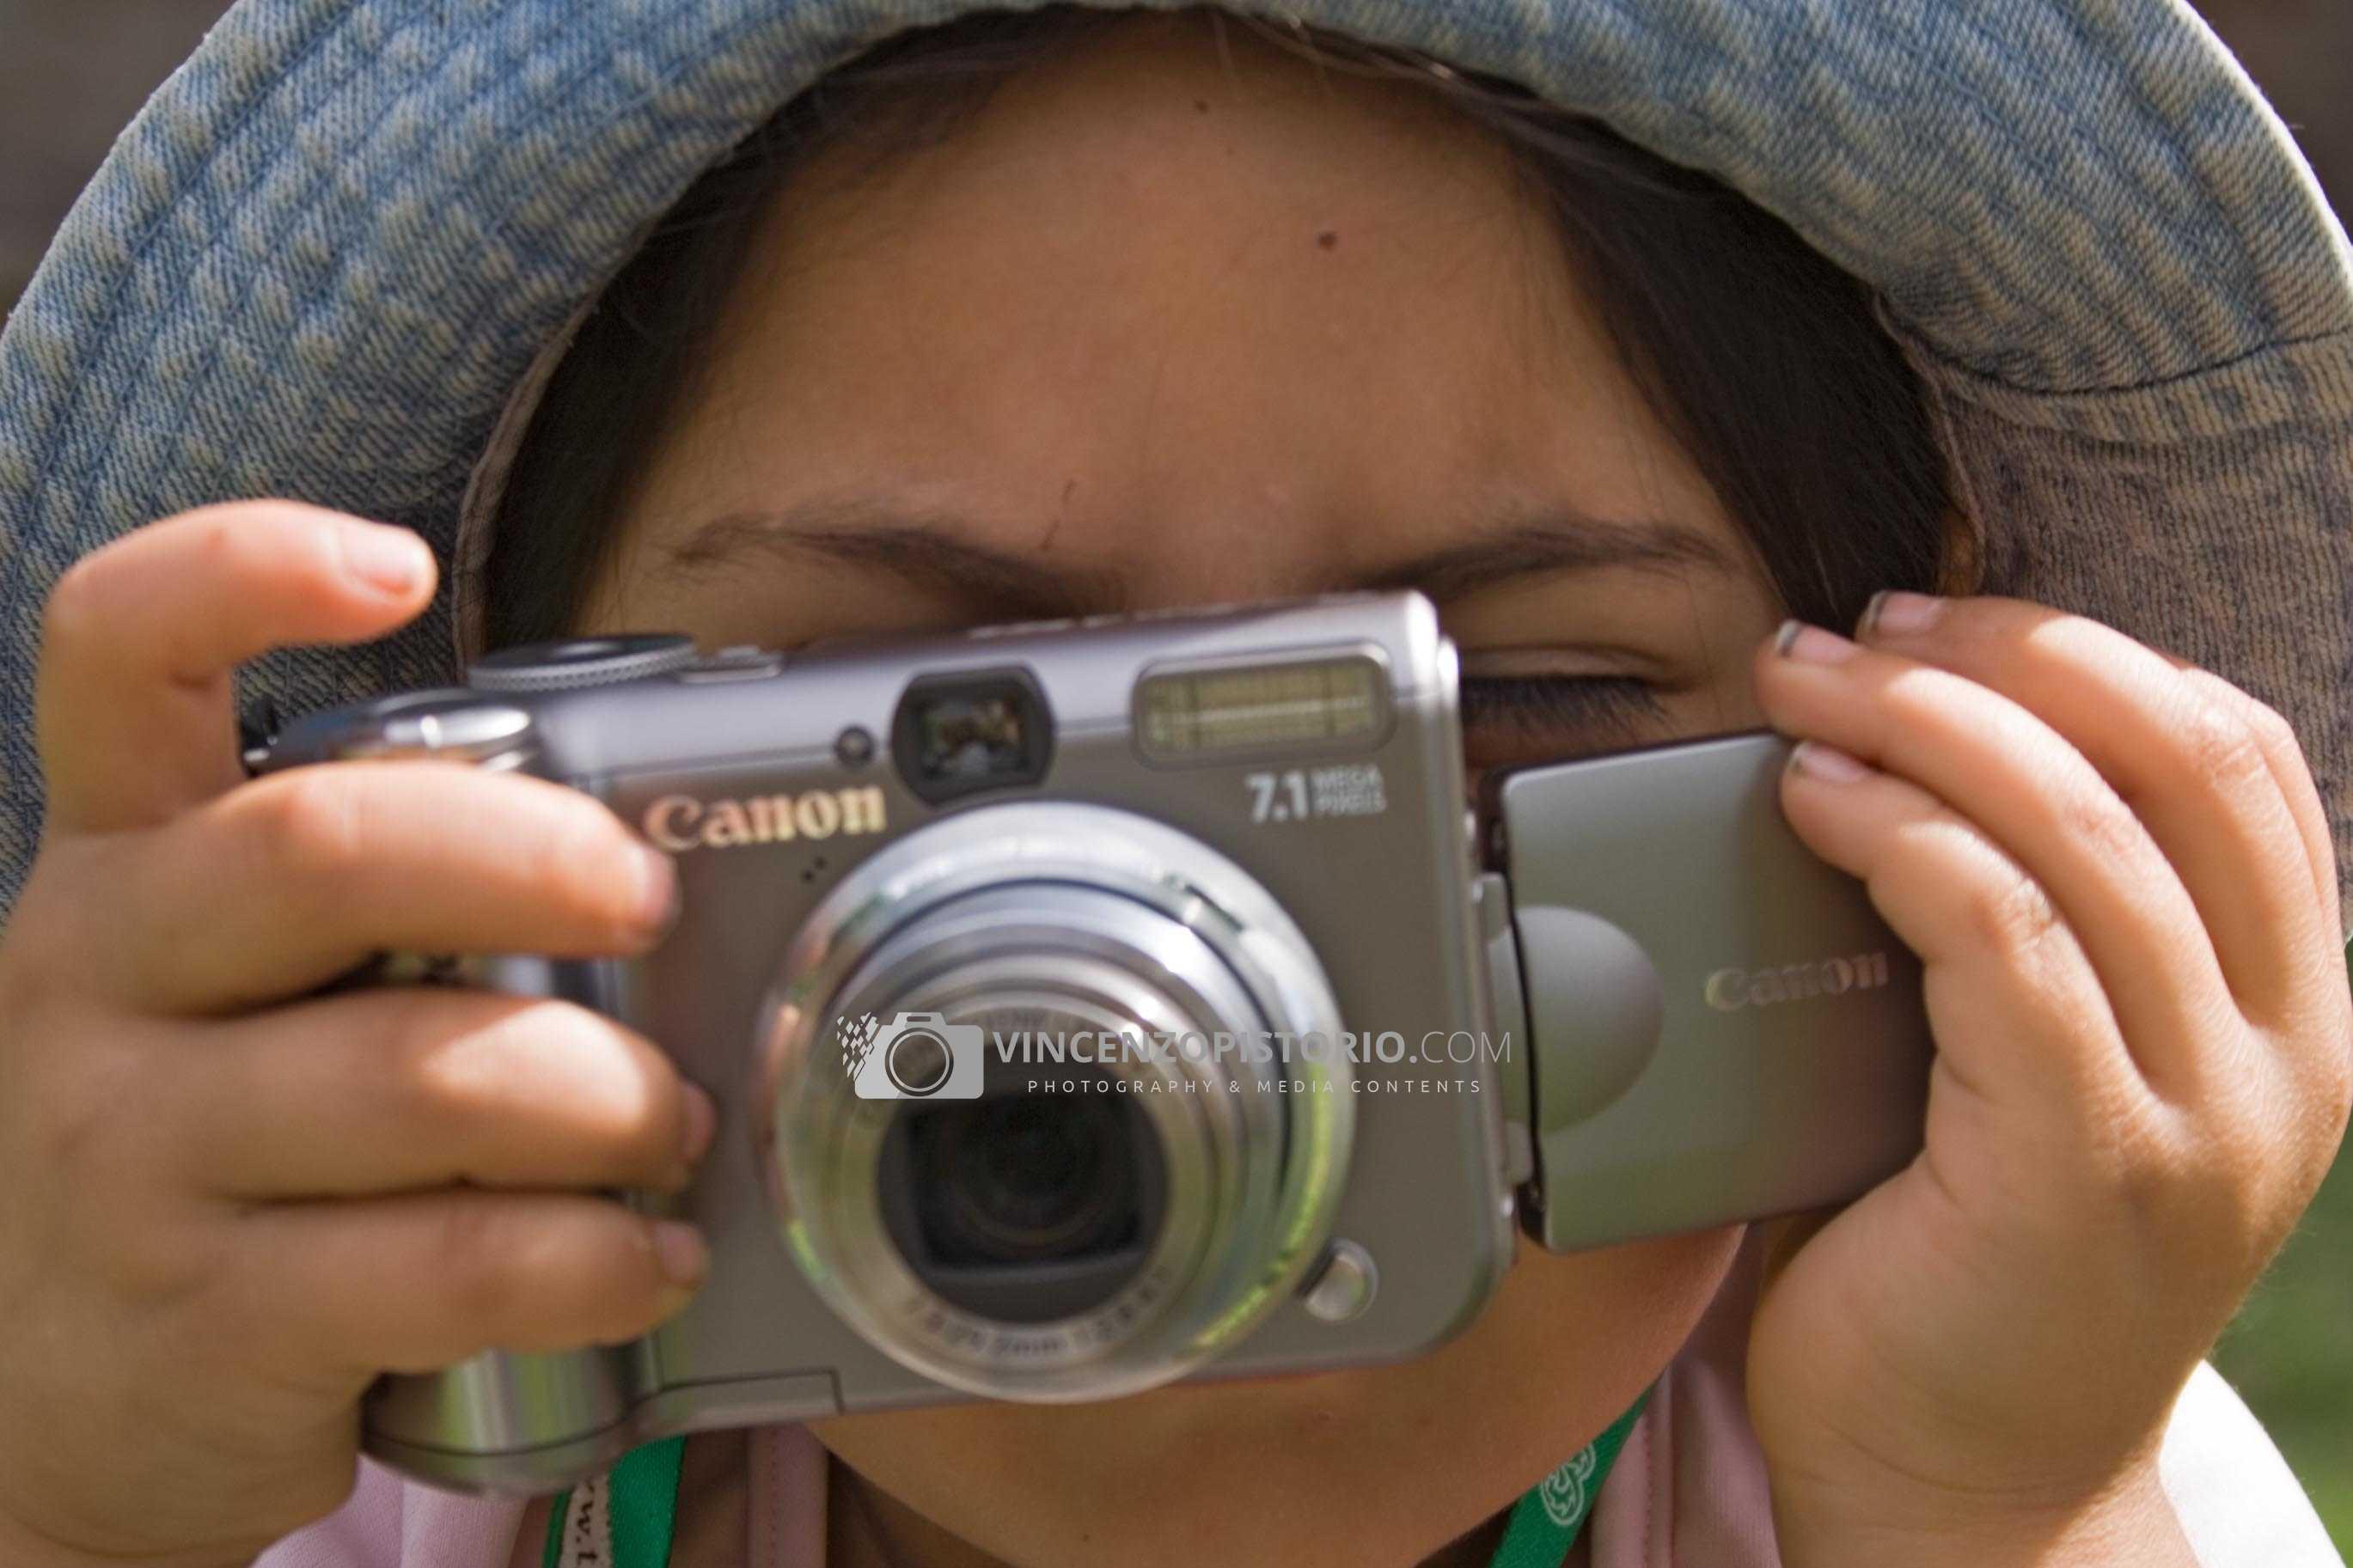 Violeta photographer